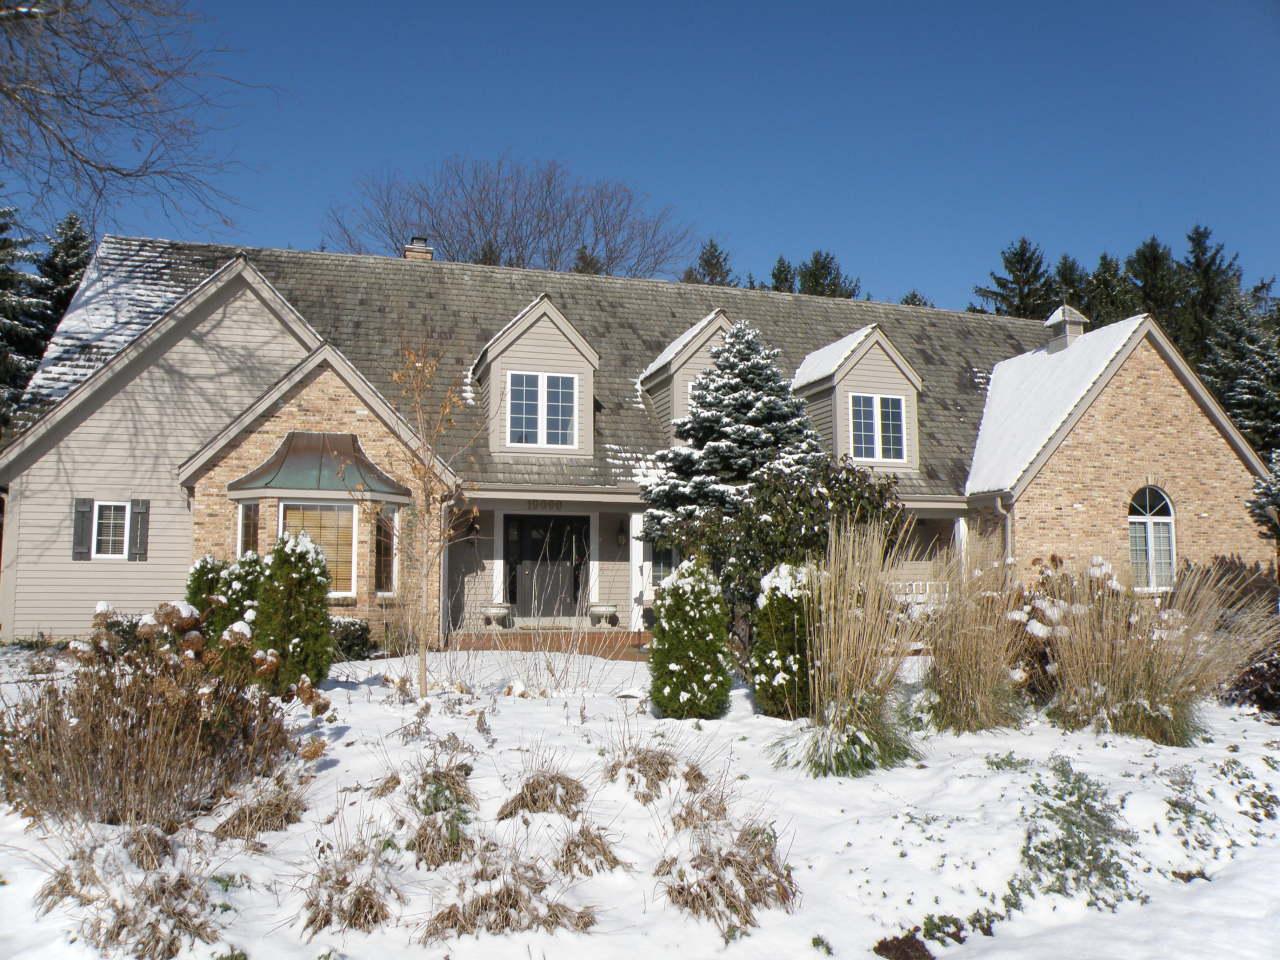 19090 Still Point Trl, Brookfield, Wisconsin 53045, 4 Bedrooms Bedrooms, 11 Rooms Rooms,4 BathroomsBathrooms,Single-Family,For Sale,Still Point Trl,1659521